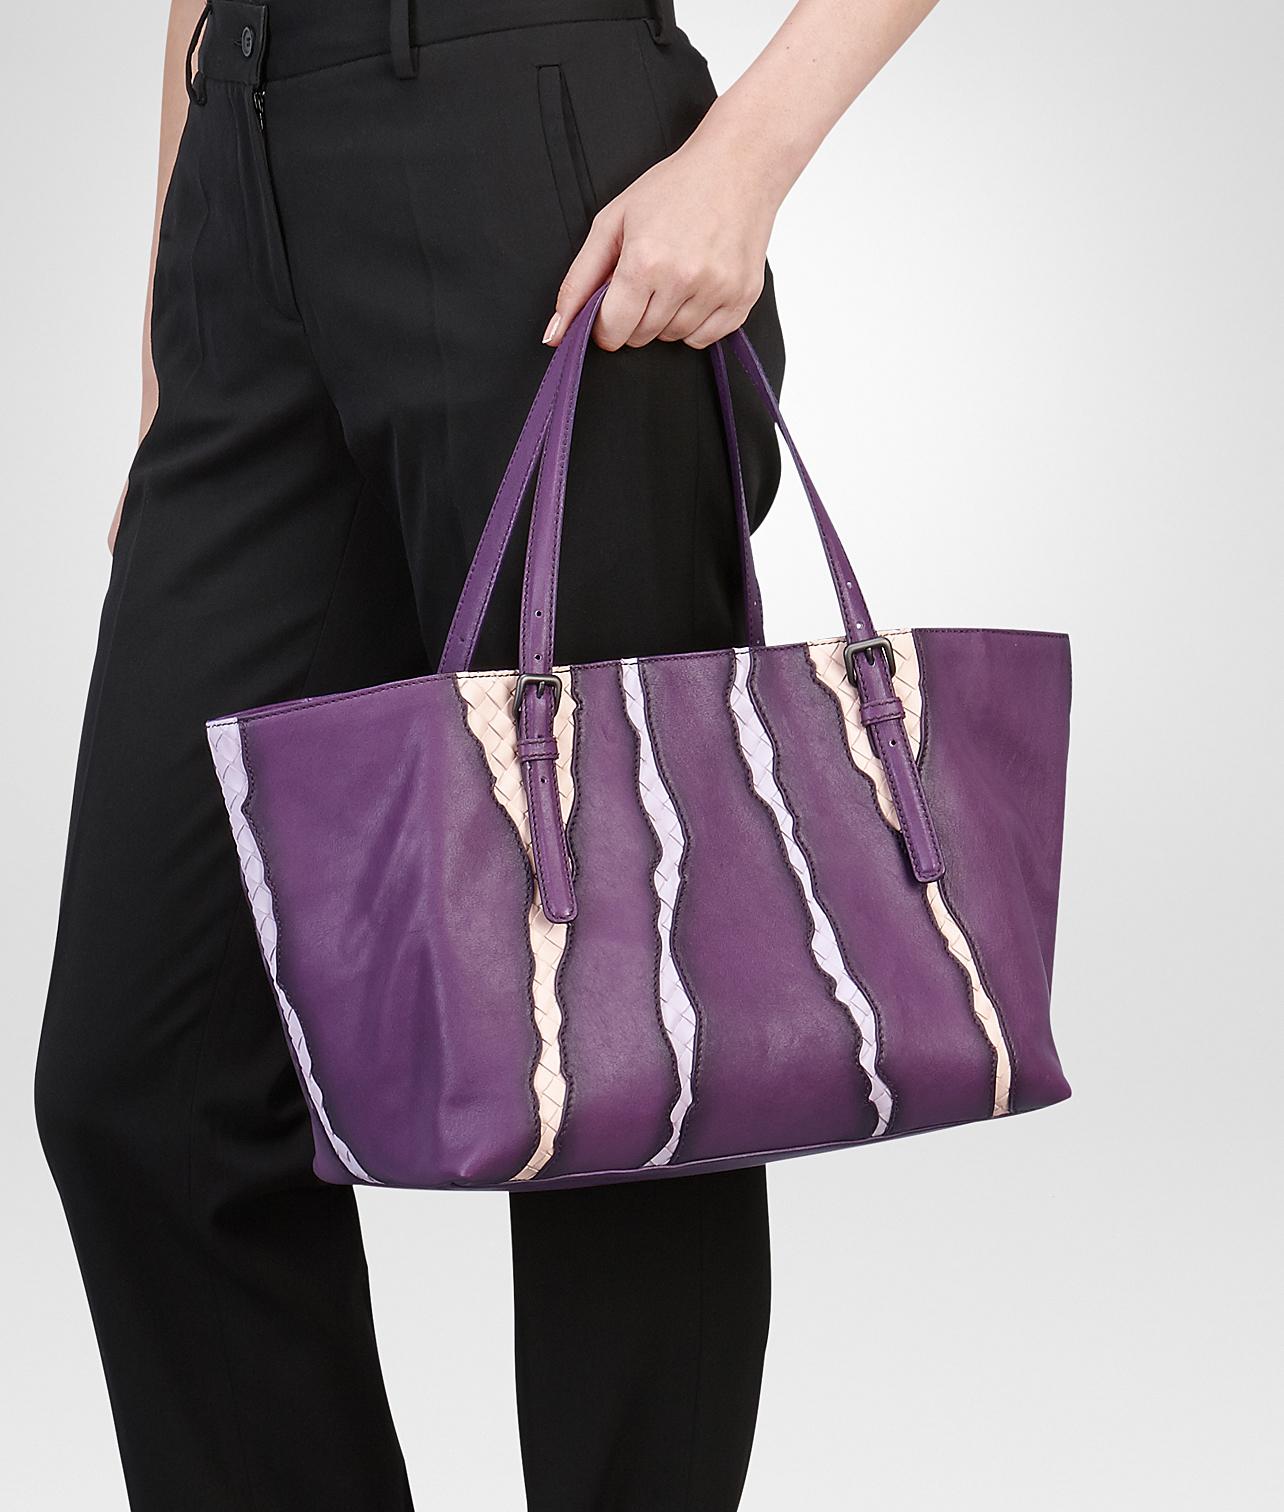 fd9977c90 Bottega Veneta Monalisa Washed Nappa Intrecciato Glimmer Tote Bag in ...